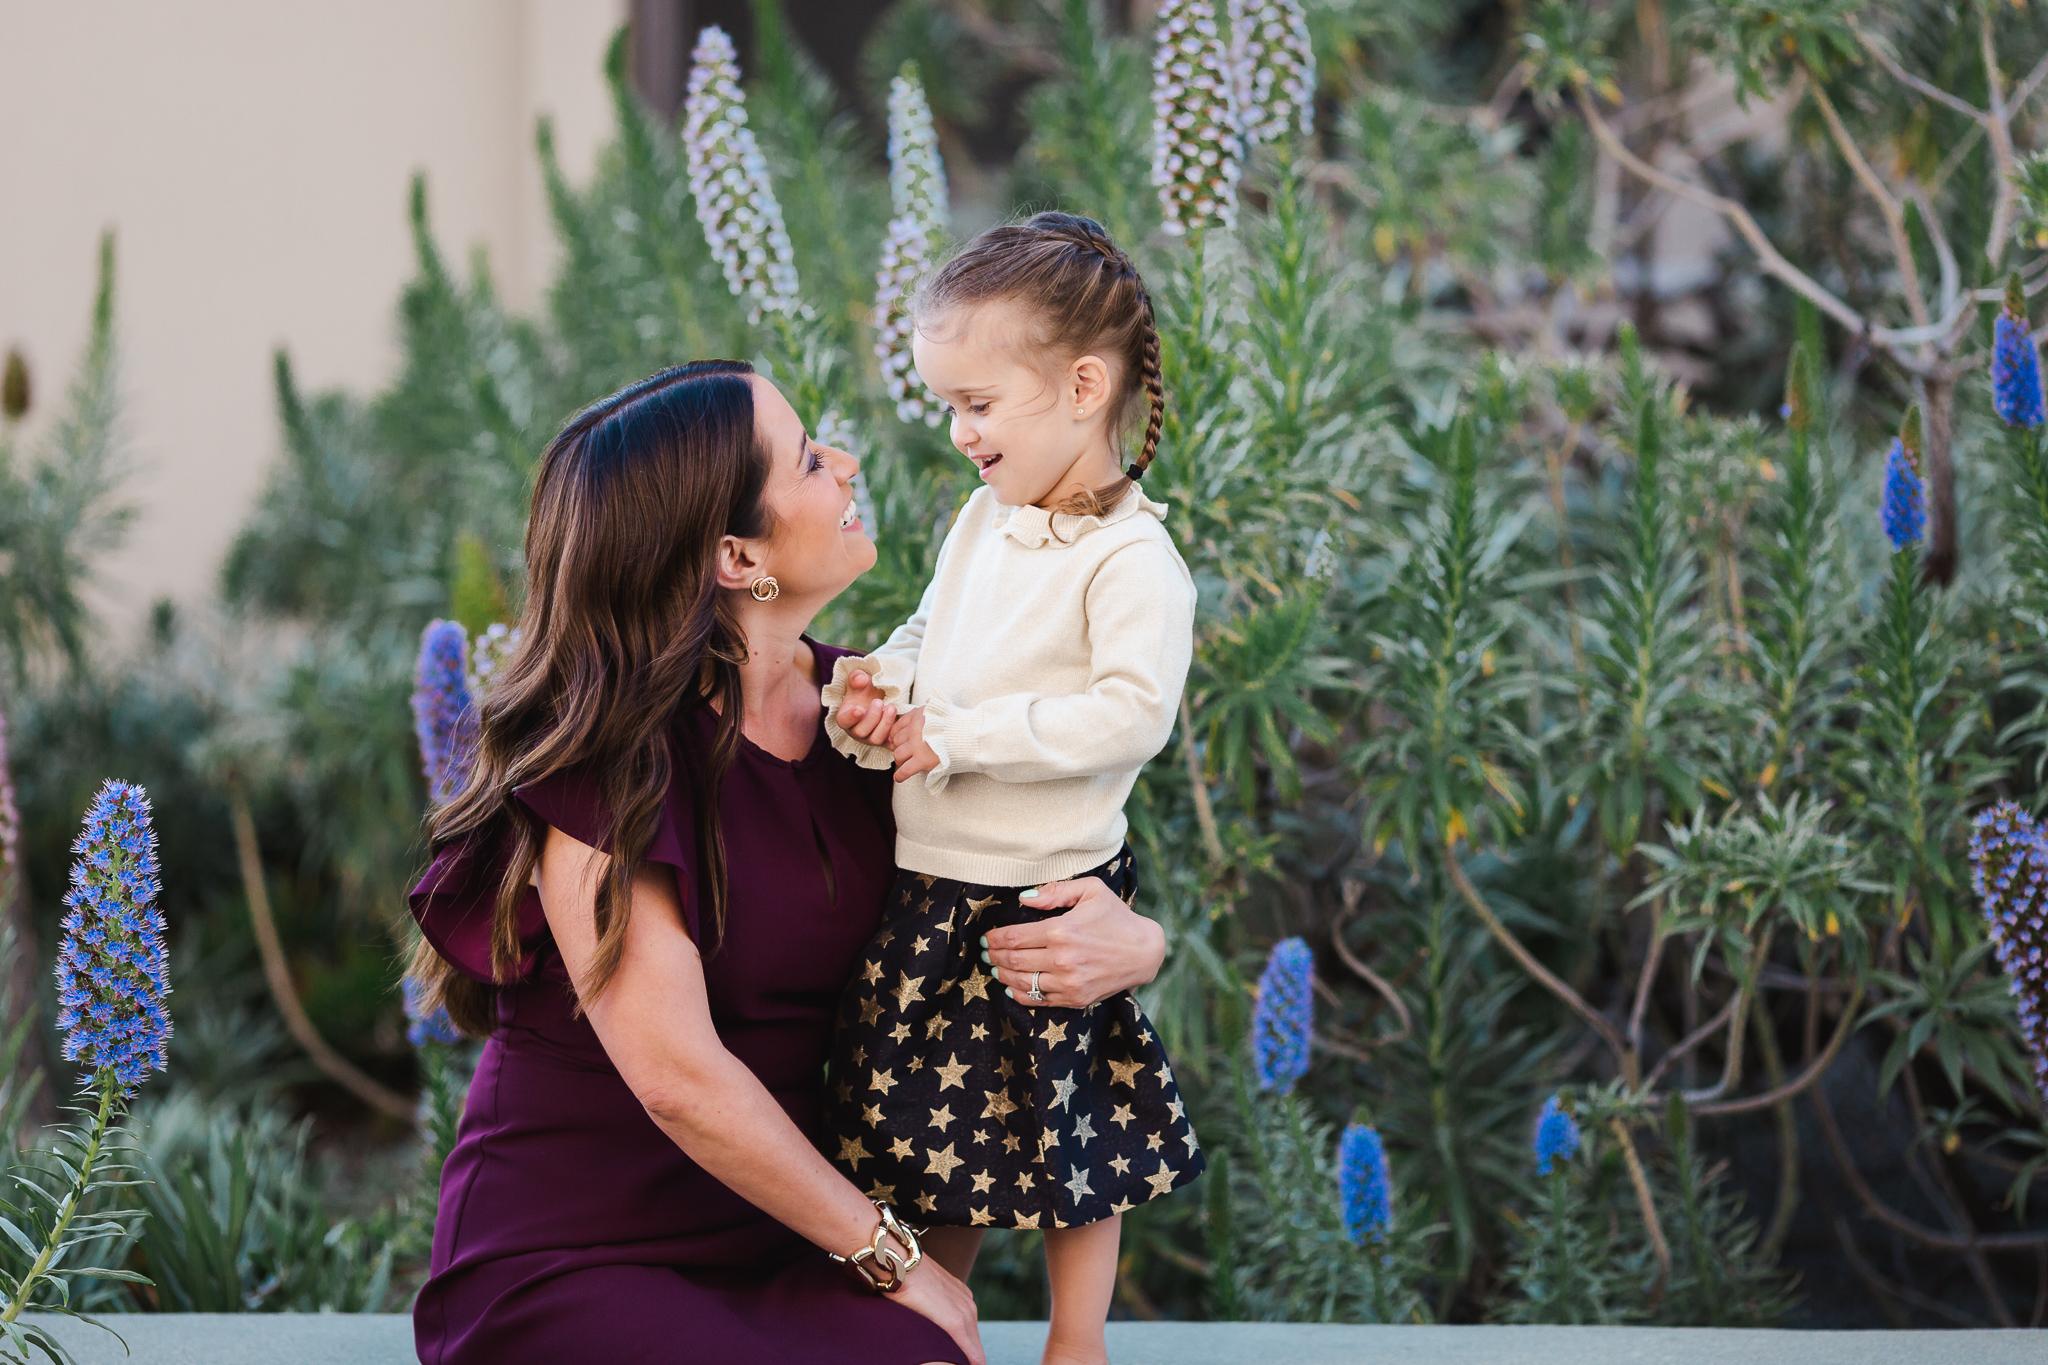 San Diego Family Photographer La Jolla Scripps Pier WS GF 2019-2.jpg